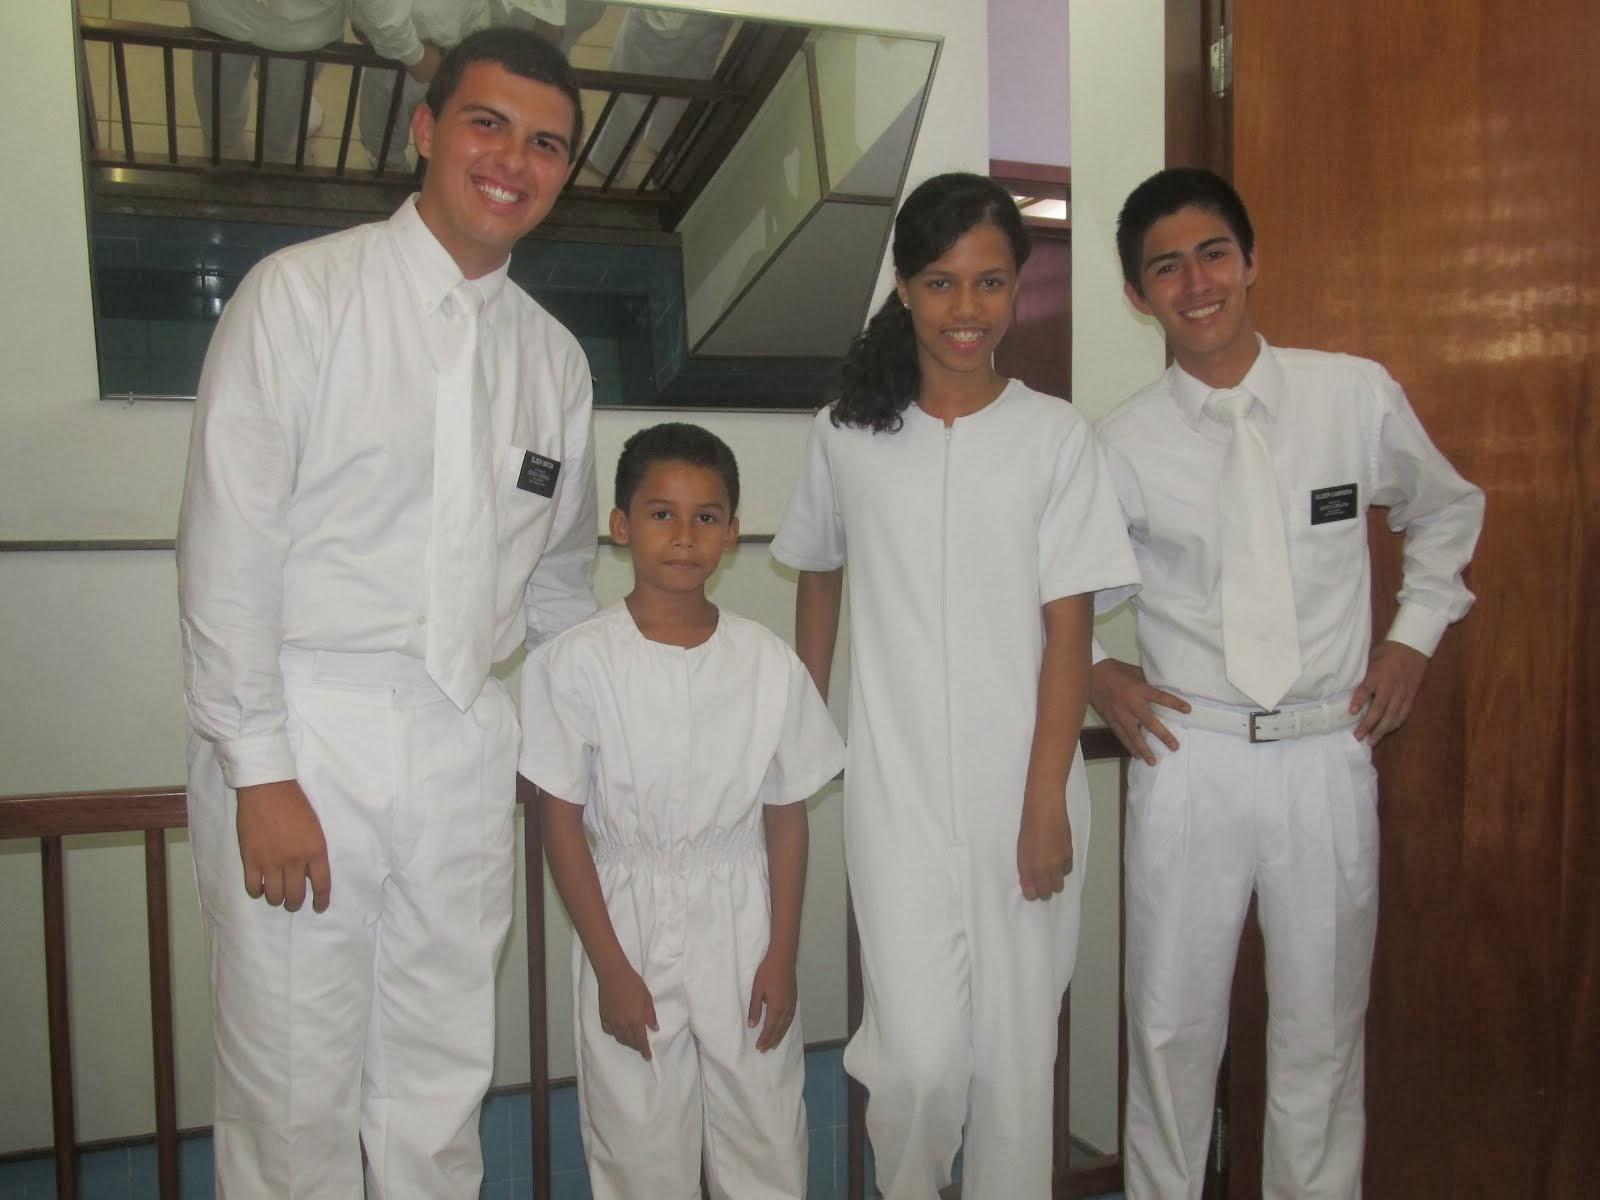 BAPTISM -- Oct. 6, 2013